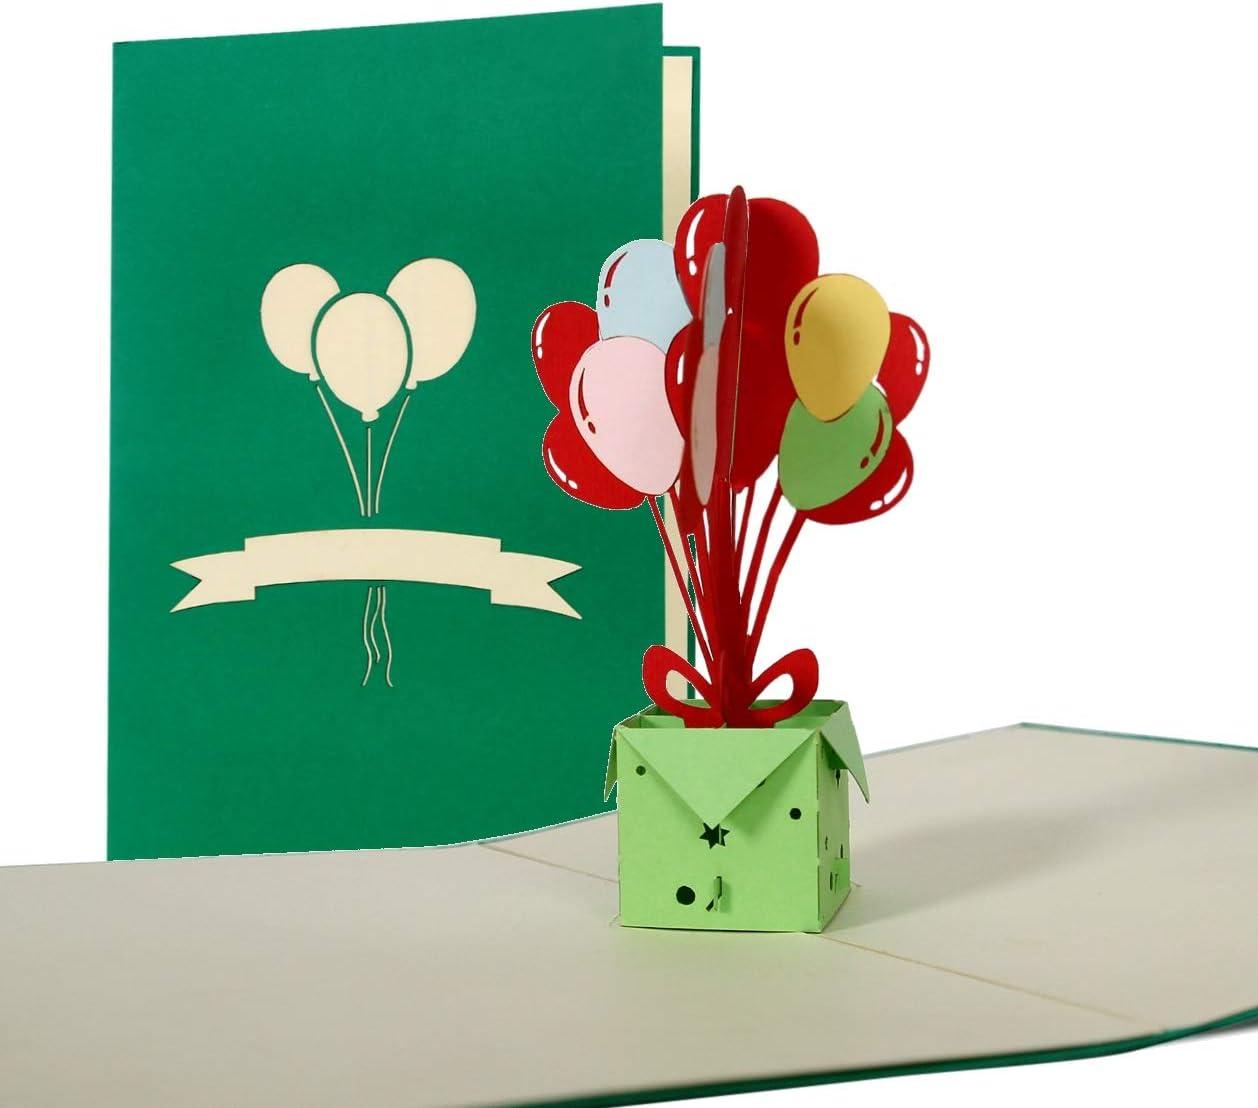 Pop Up carte d'anniversaire avec ballons, idéal comme invitation ou glueckwunschkarte, Happy Birthday carte G15